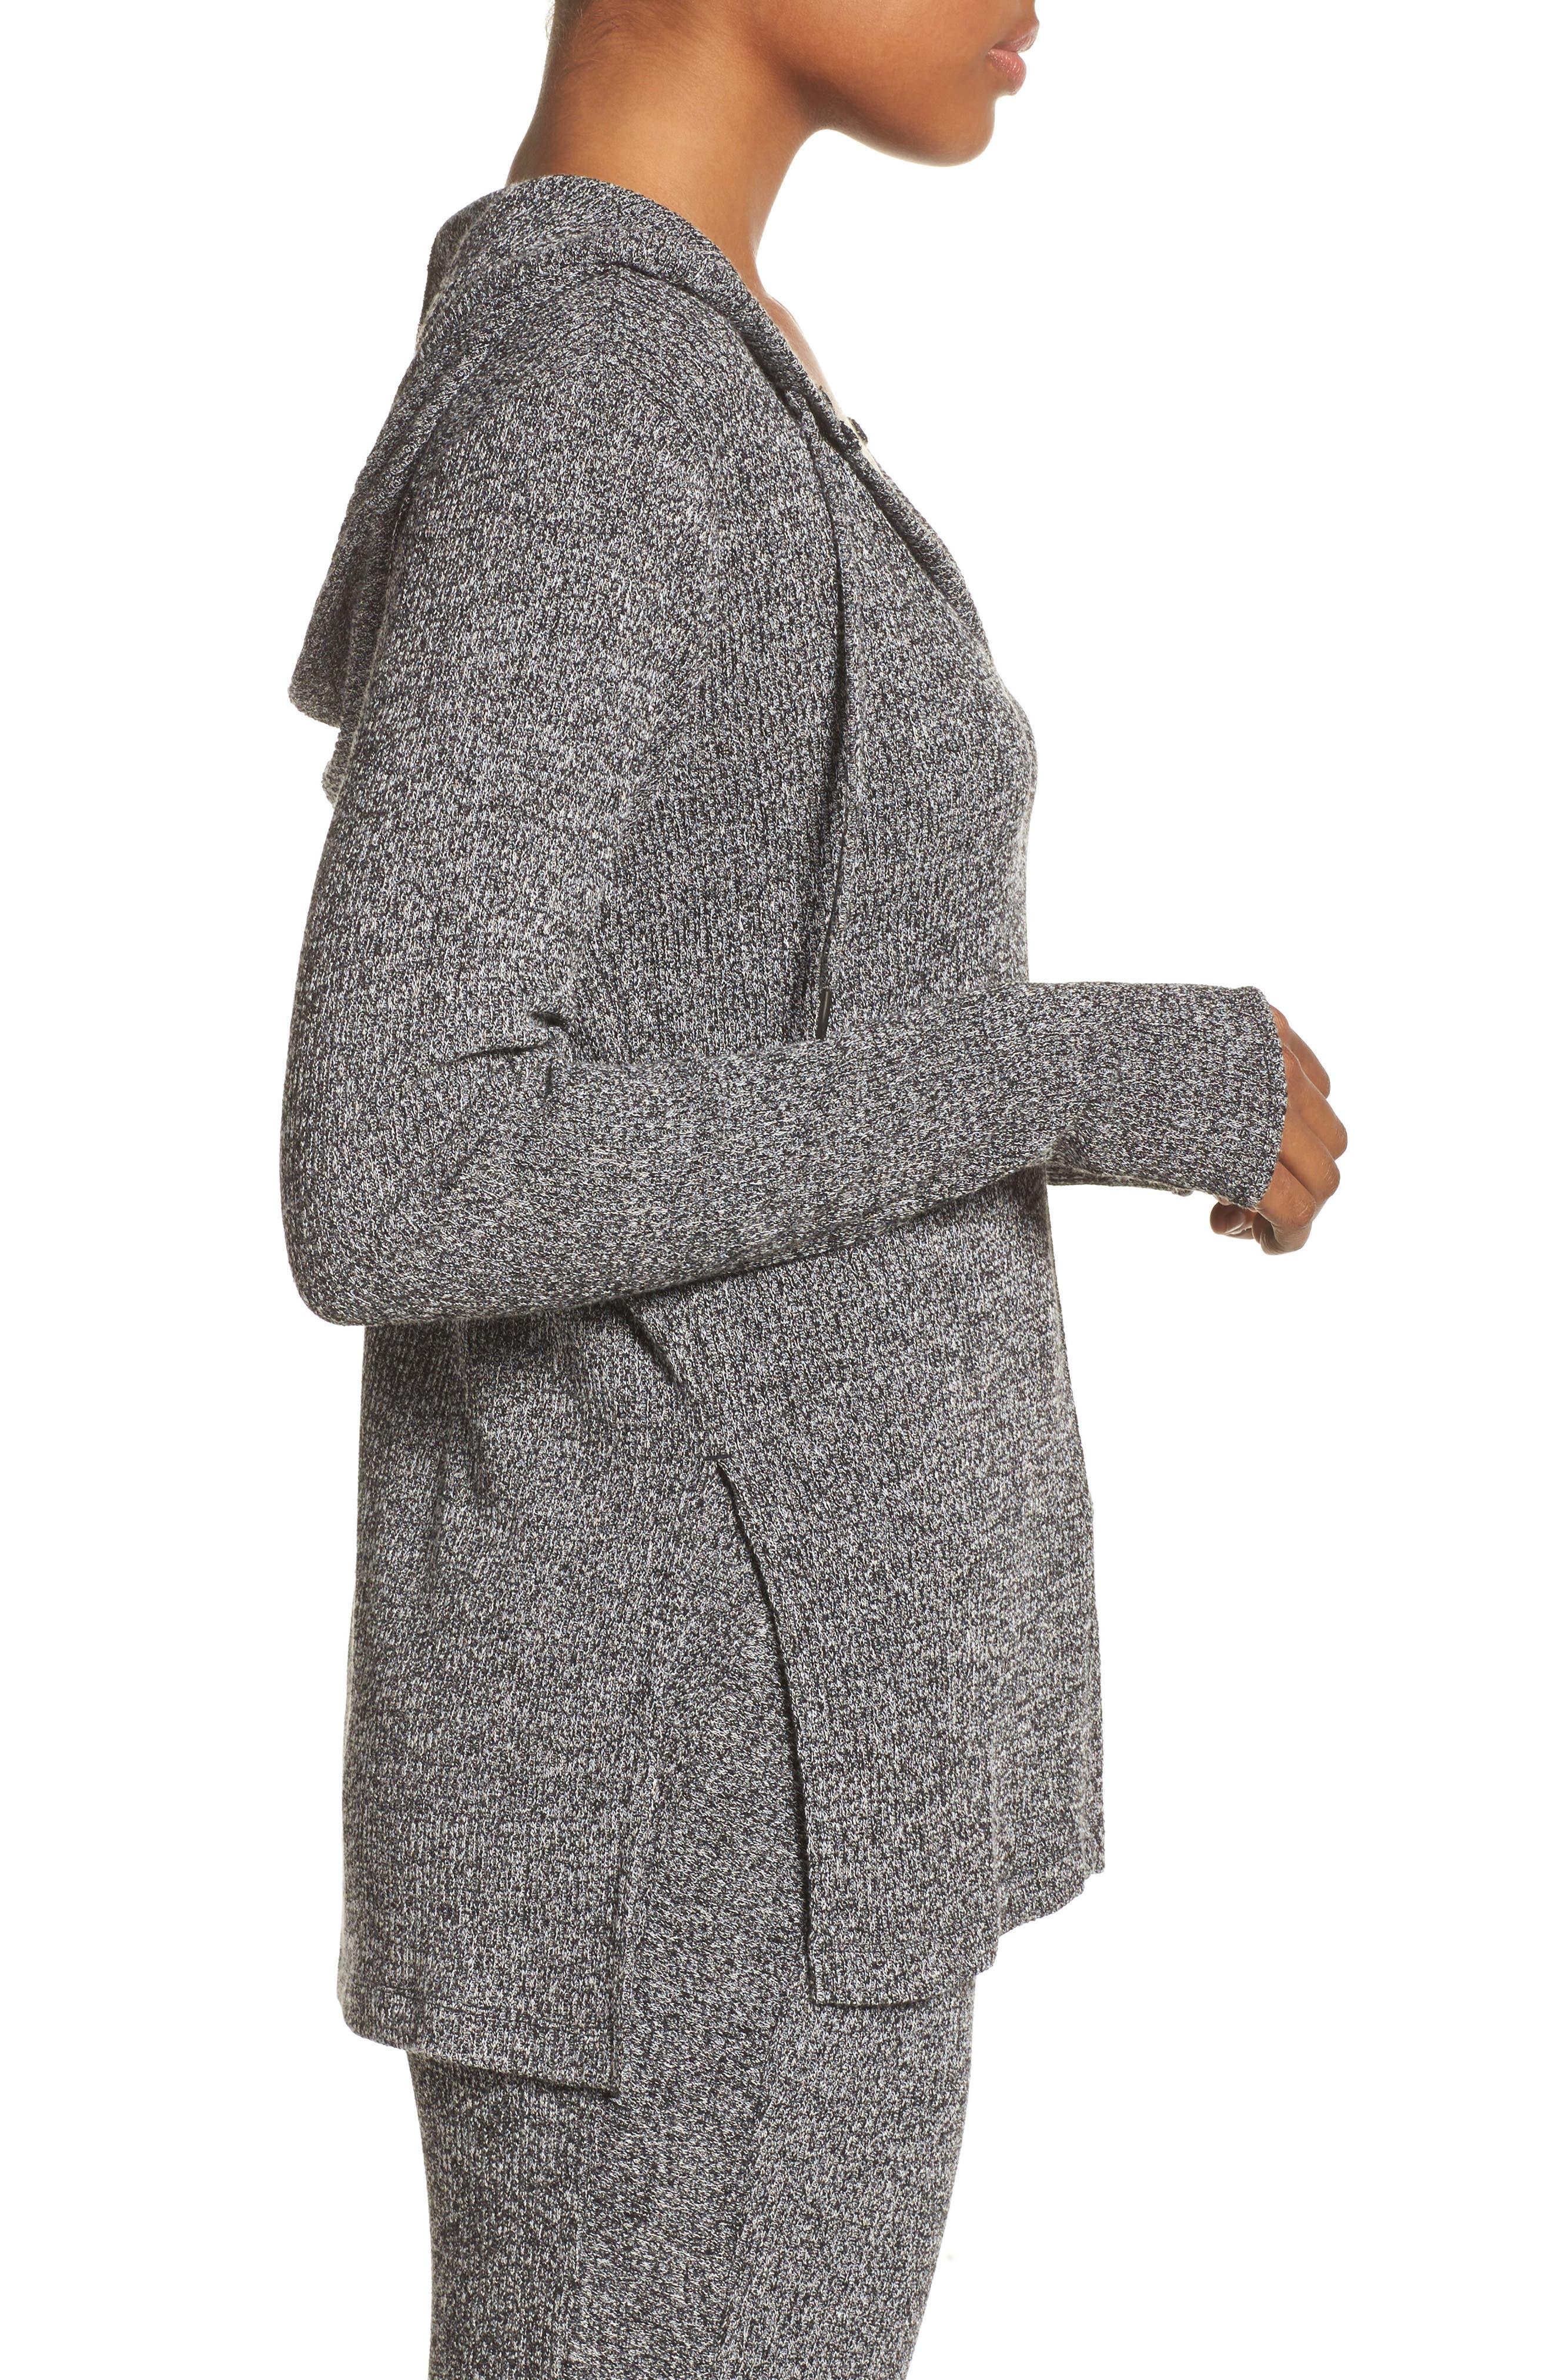 Alternate Image 3  - Zella Mantra Hooded Pullover Top